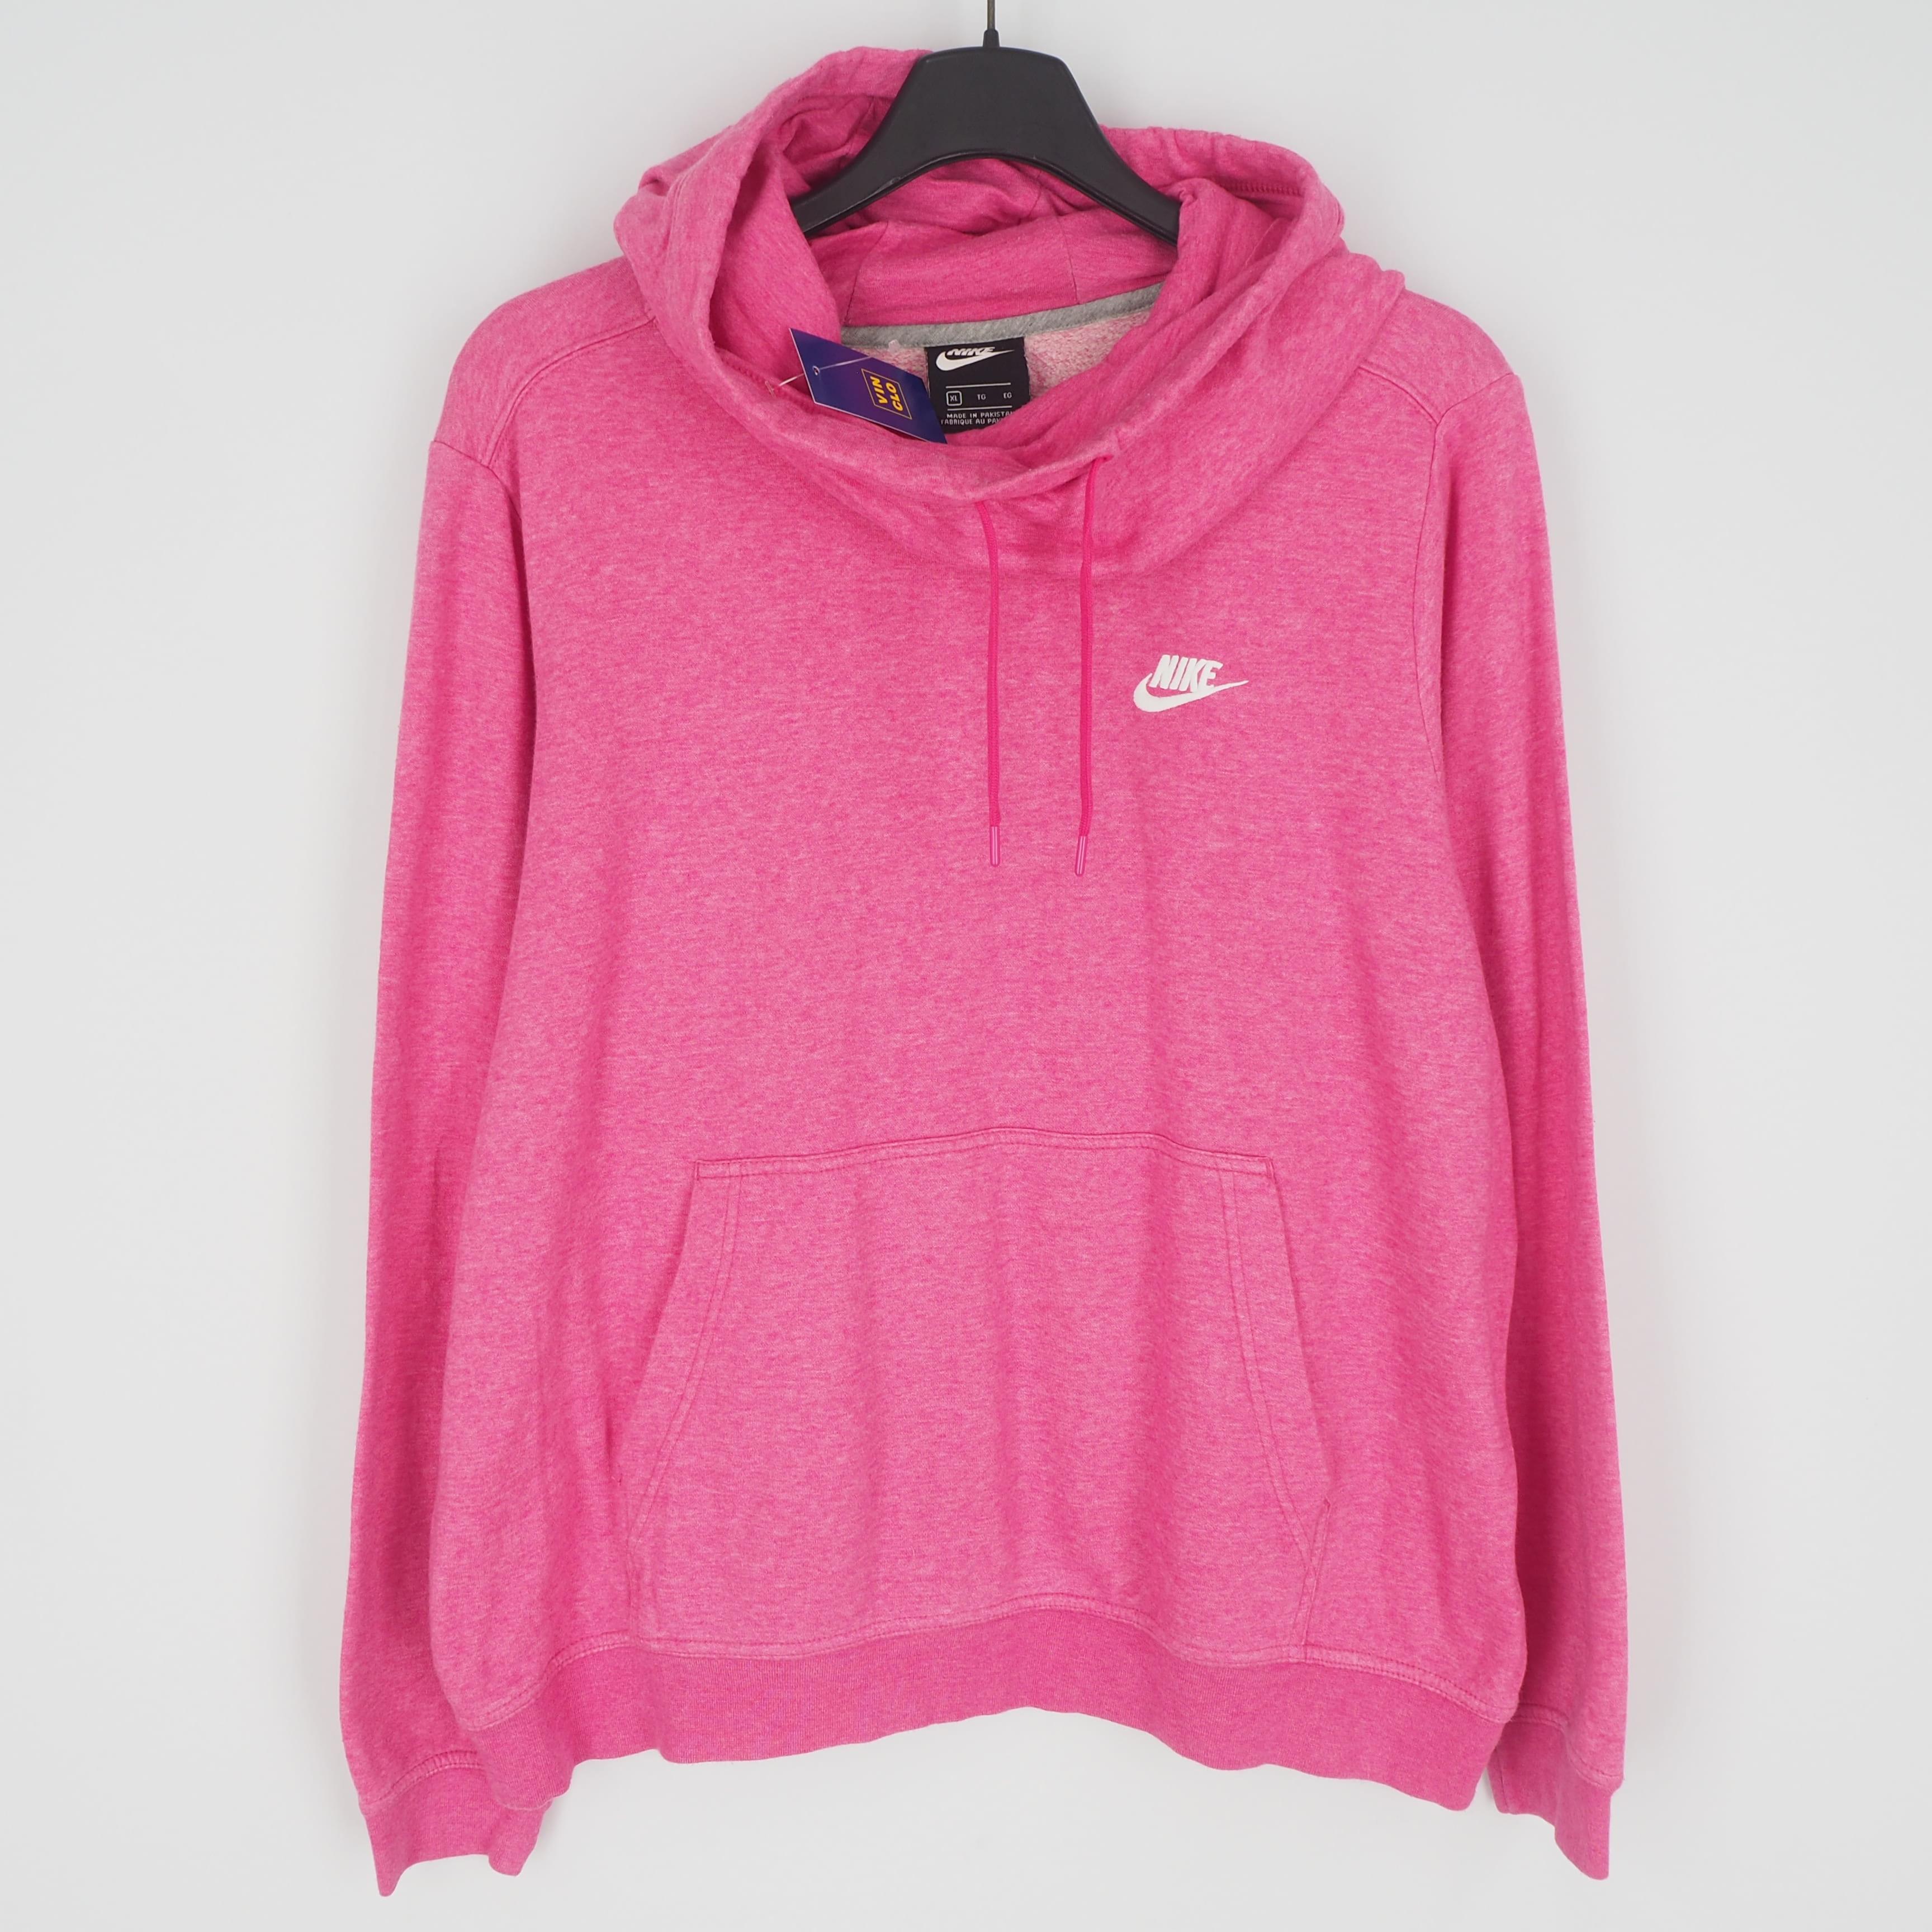 [XL] 나이키 긴팔 후드 티셔츠 (W)